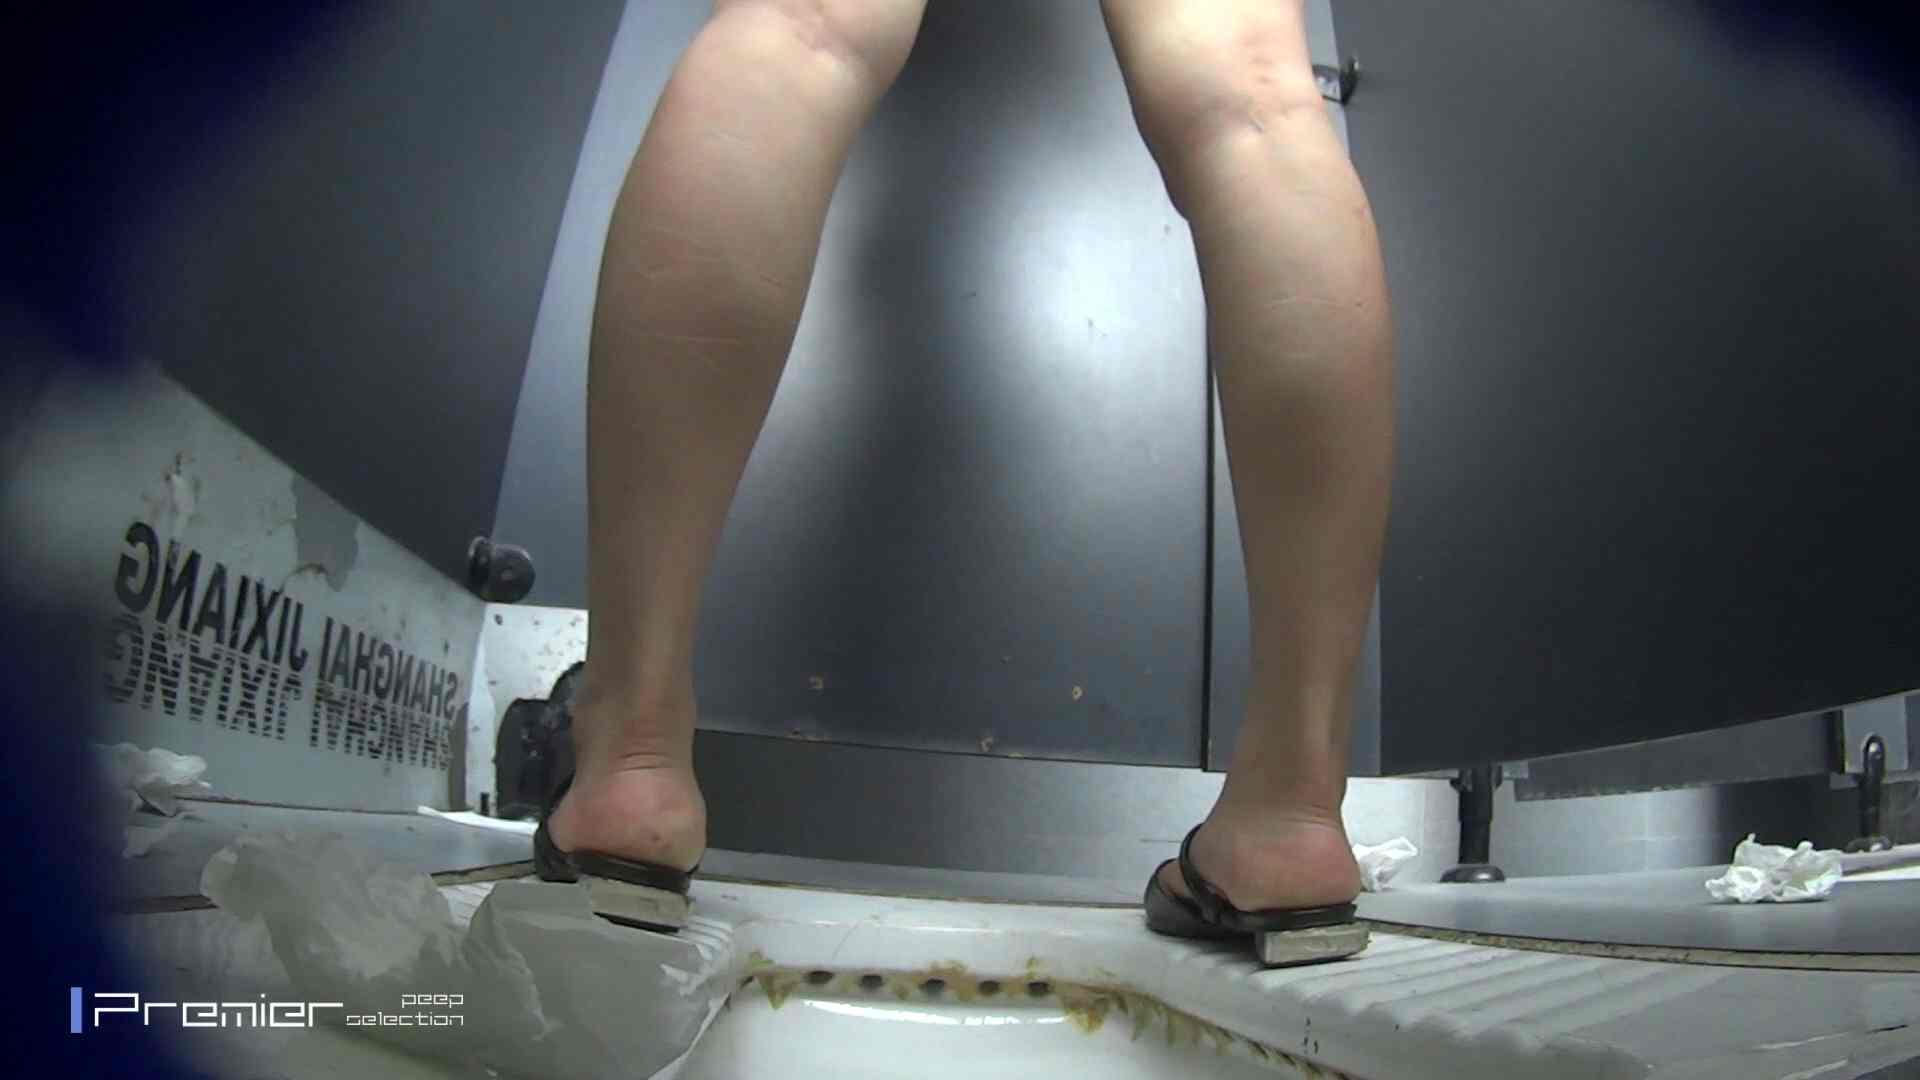 聖水ダラダラ色美女の洗面所 大学休憩時間の洗面所事情55 洗面所  55PIX 22